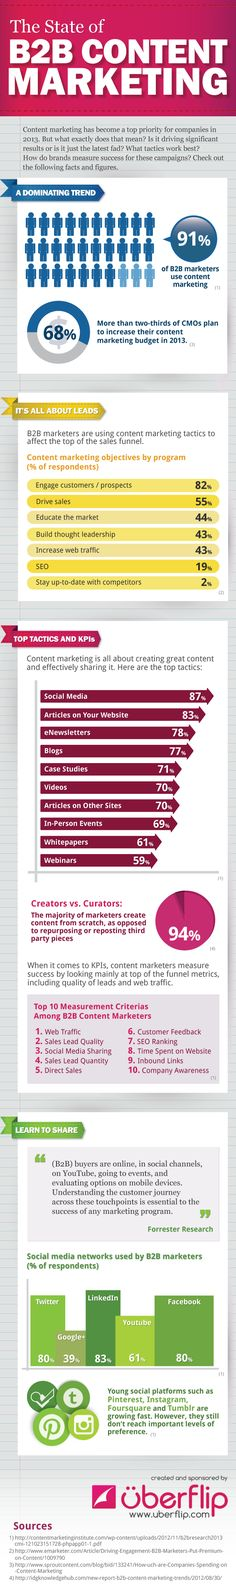 INFOGRAPHIC: The State of B2B Content Marketing | Uberflip